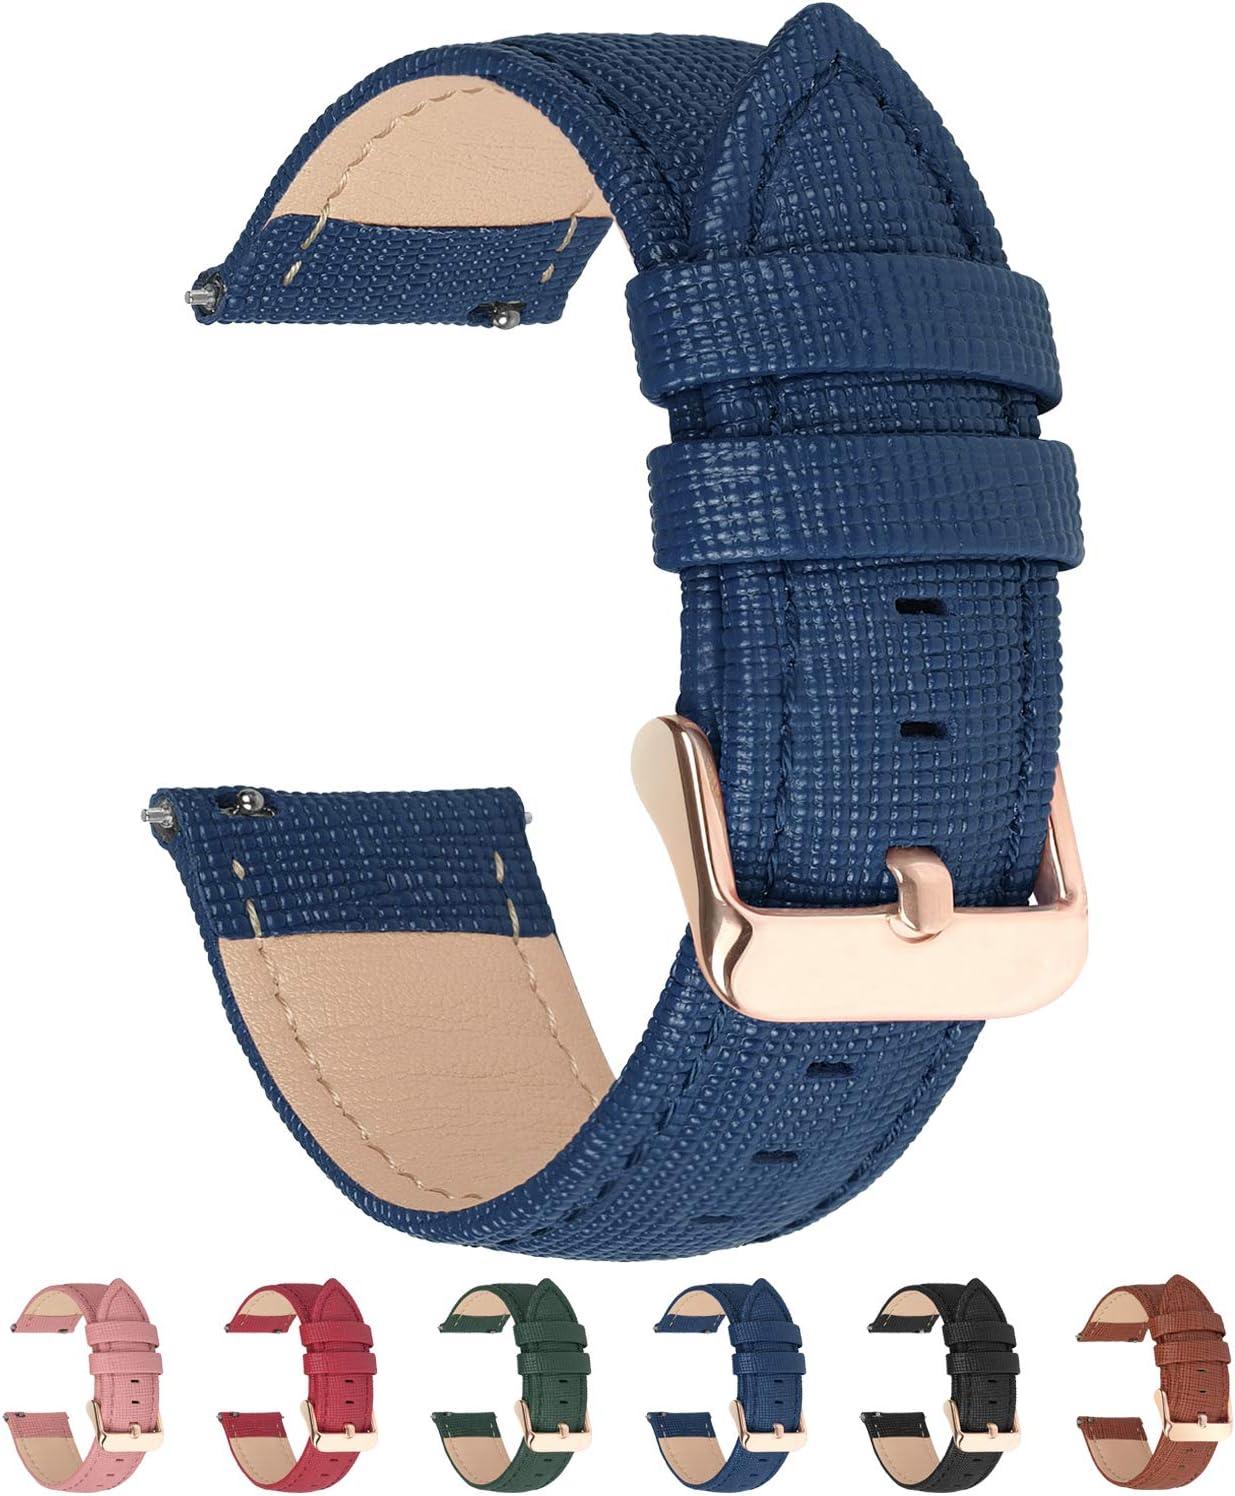 Fullmosa 6 Colores para Correa de Reloj, Cross Piel Correa Huawei Samsung Correa/Banda/Band/Pulsera/Strap de Recambio/Reemplazo 18mm 20mm 22mm 24mm,Azul Oscuro 22mm